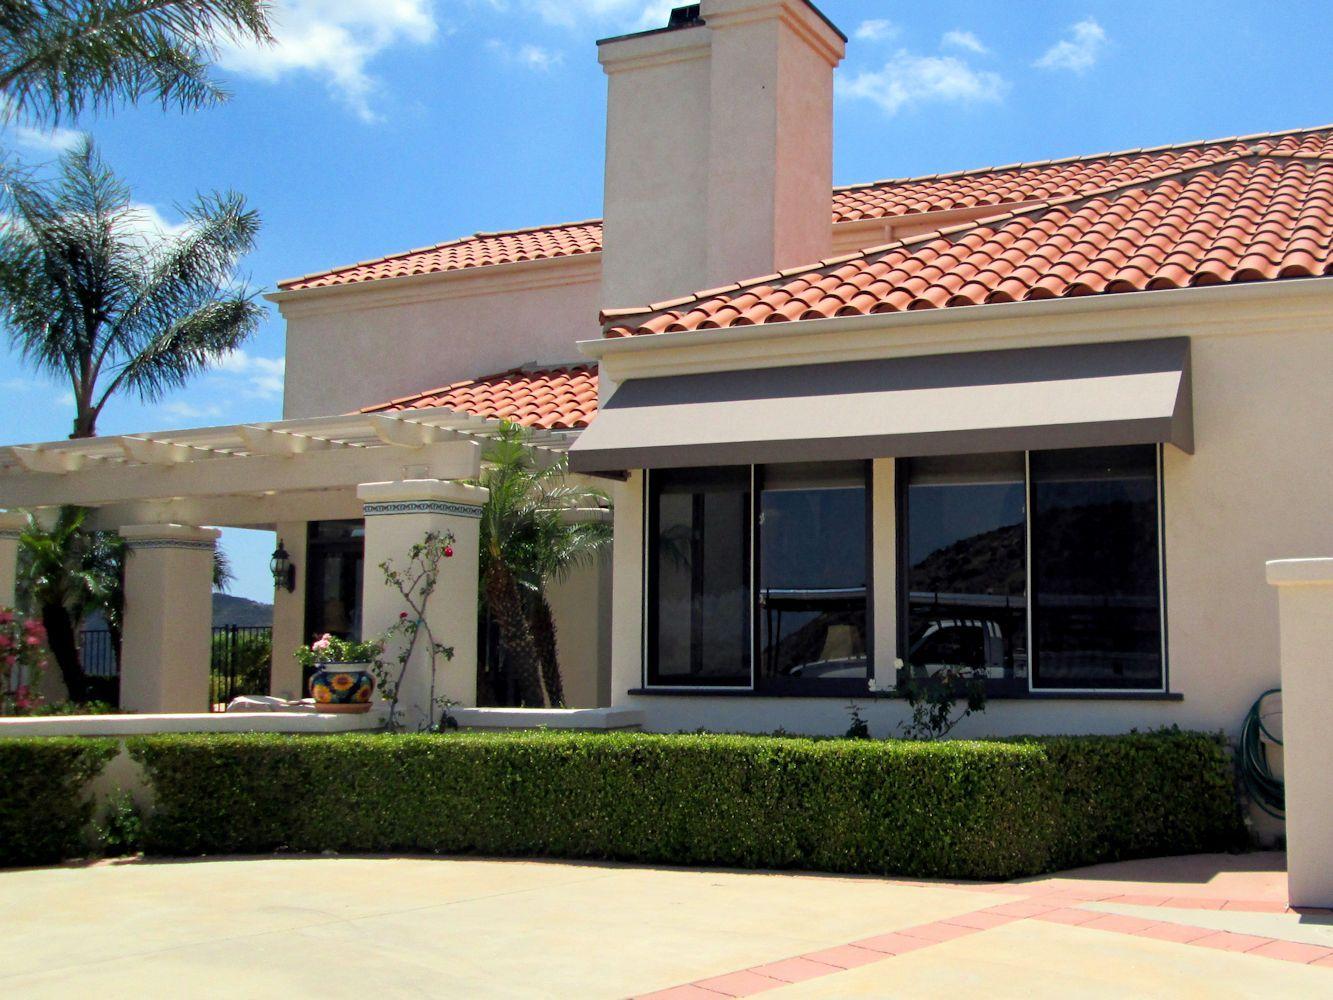 Residential Awnings | Residential awnings, Custom awnings ...